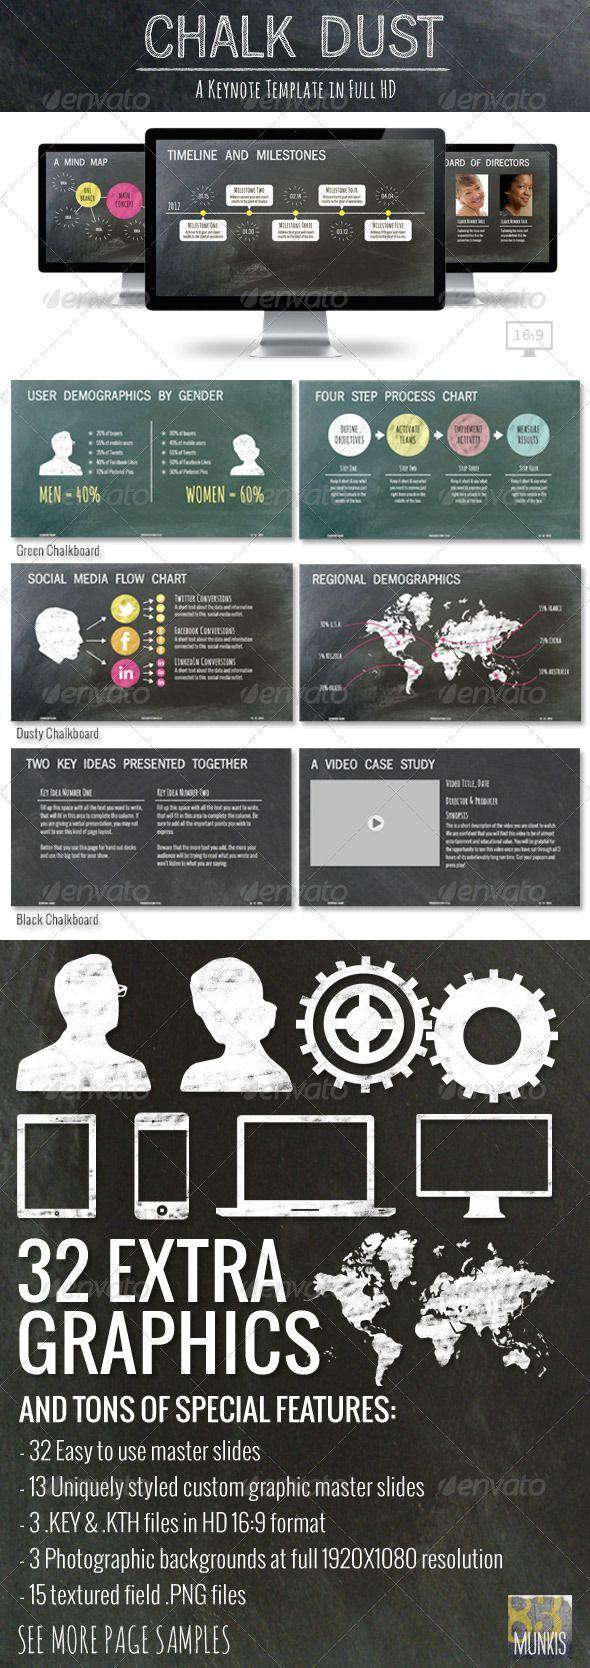 Chalk Dust Keynote Presentation Template - GraphicRiver Item for Sale